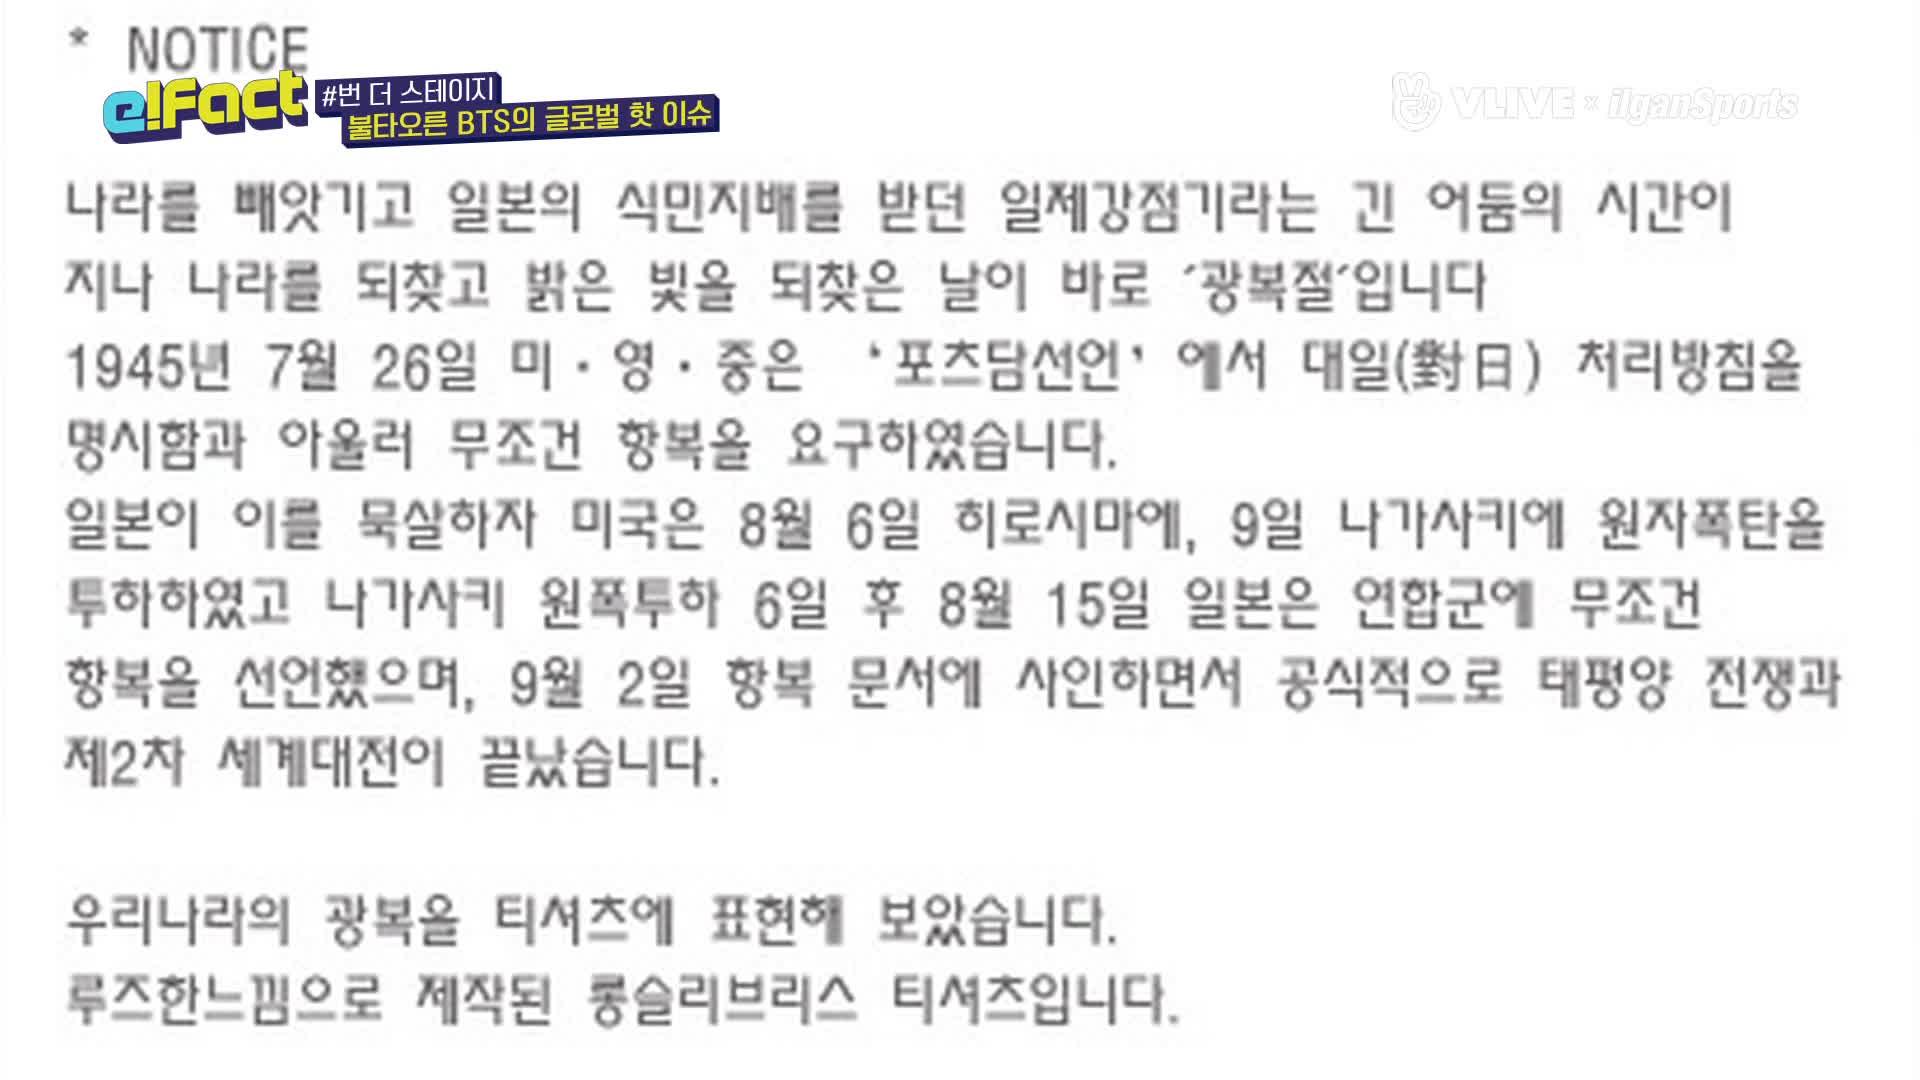 BTS 첫 영화 개봉! 전석매진 <번 더 스테이지>가 쏘아 올린 글로벌 핫이슈